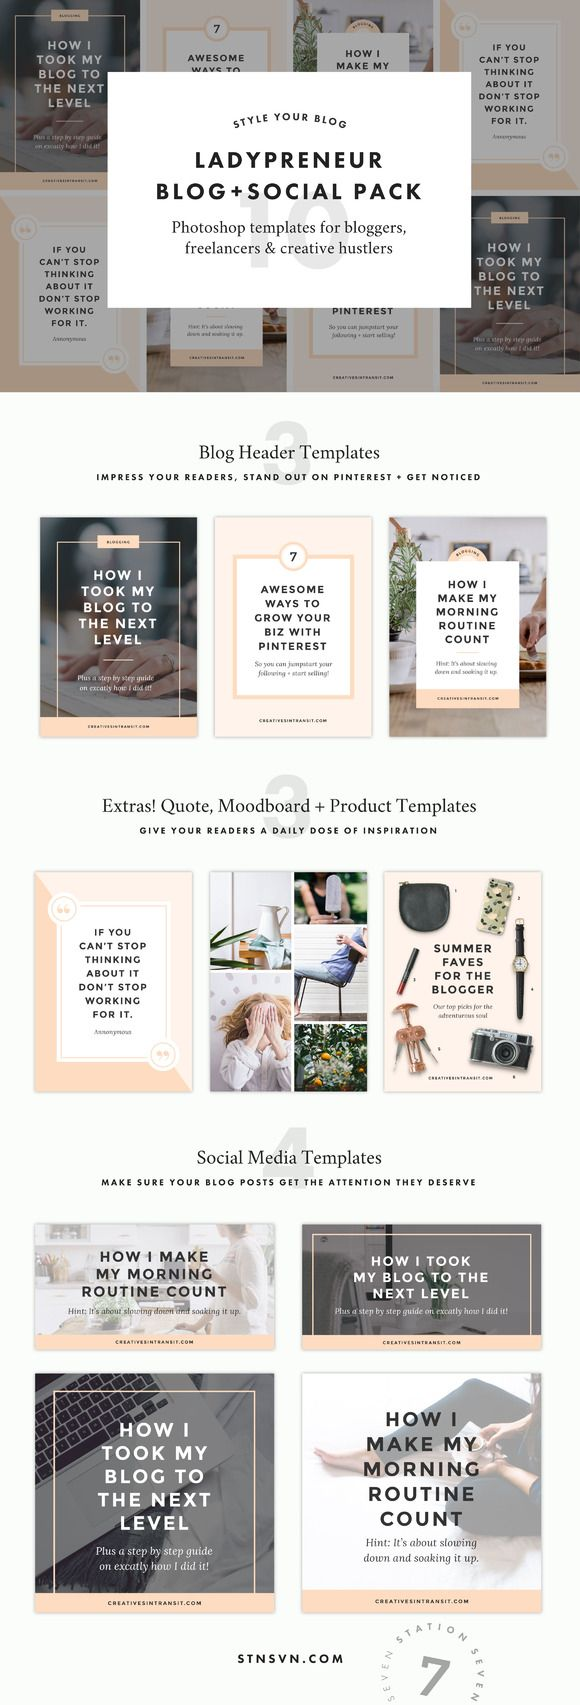 Ladypreneur Blog + Social Pack by Station Seven on @creativemarket